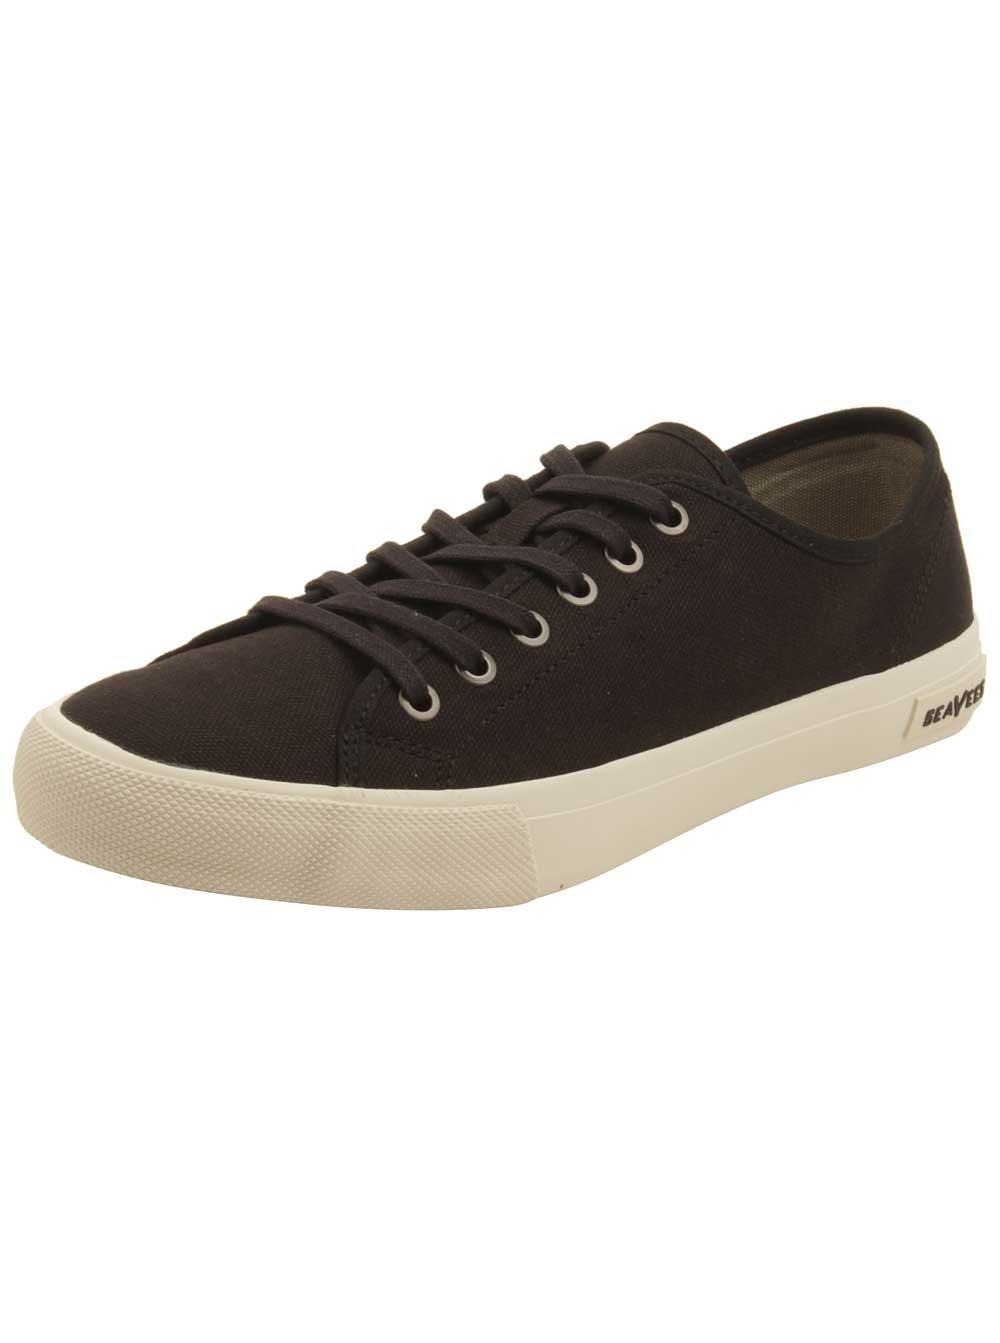 SeaVees Men's Monterey Standard Sneaker B007BQYQ9M 8.5 M US|Black